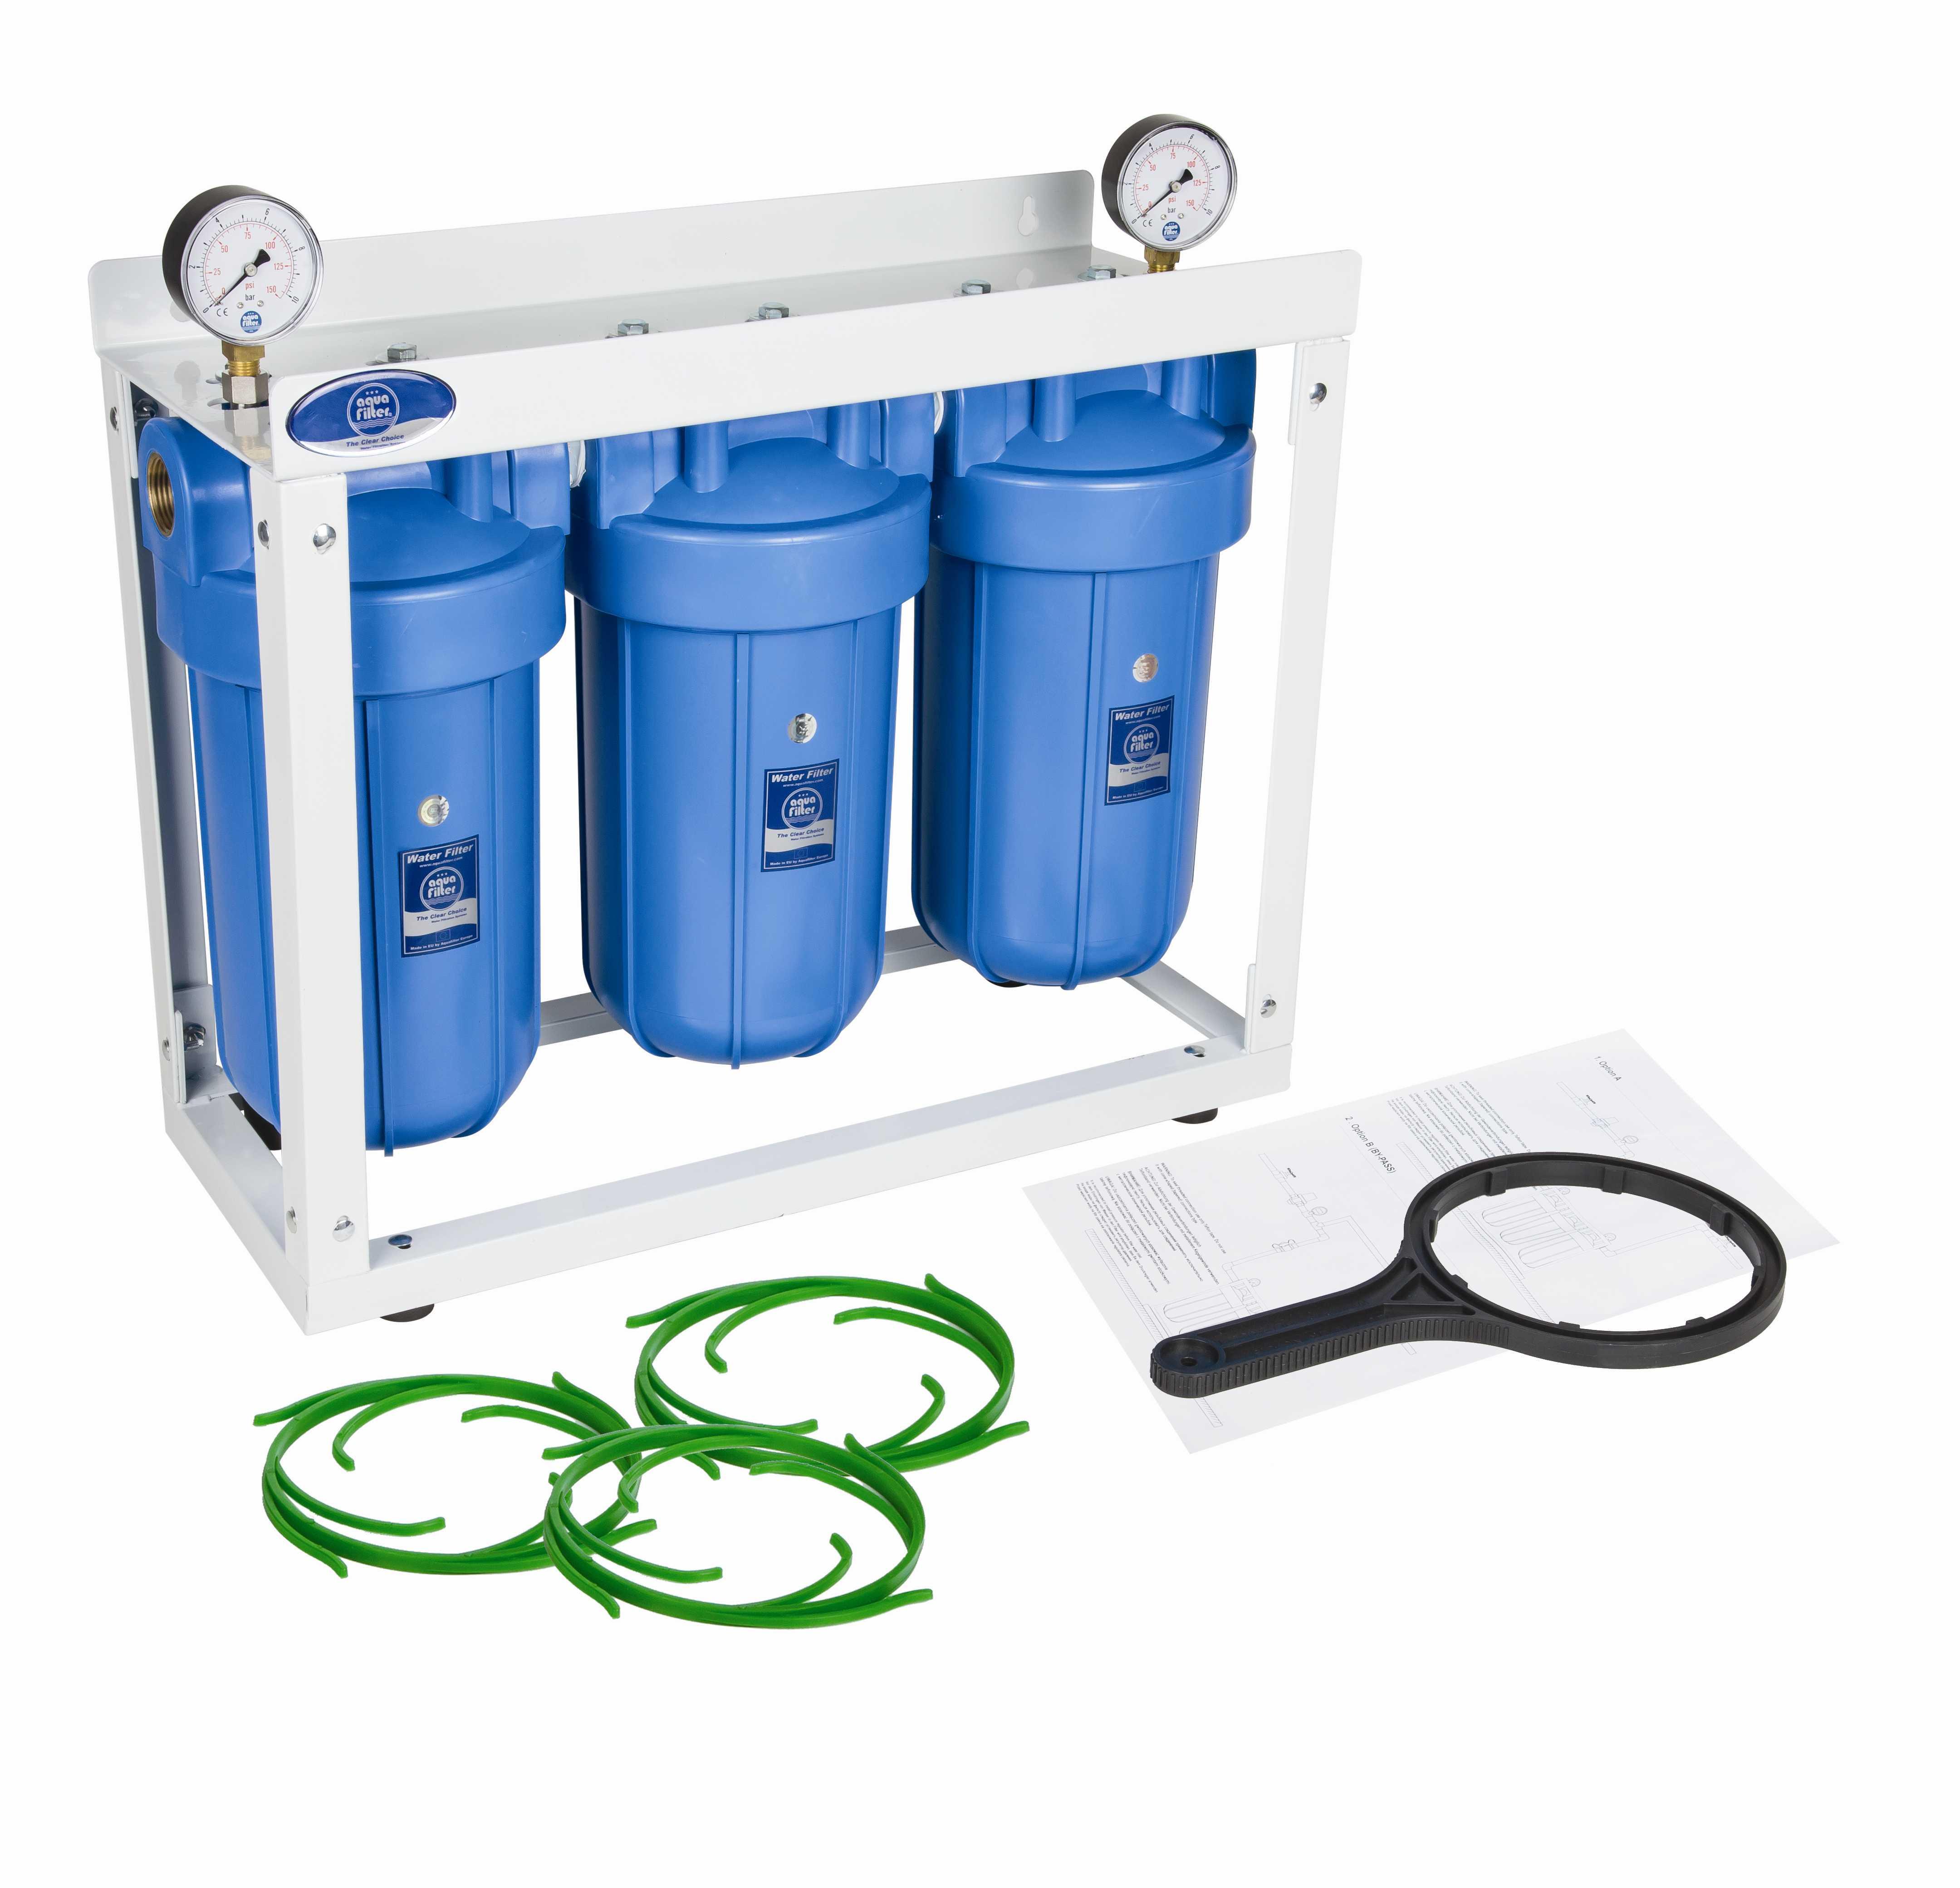 ������ ������������� ��� ���� Aquafilter Hhbb10b